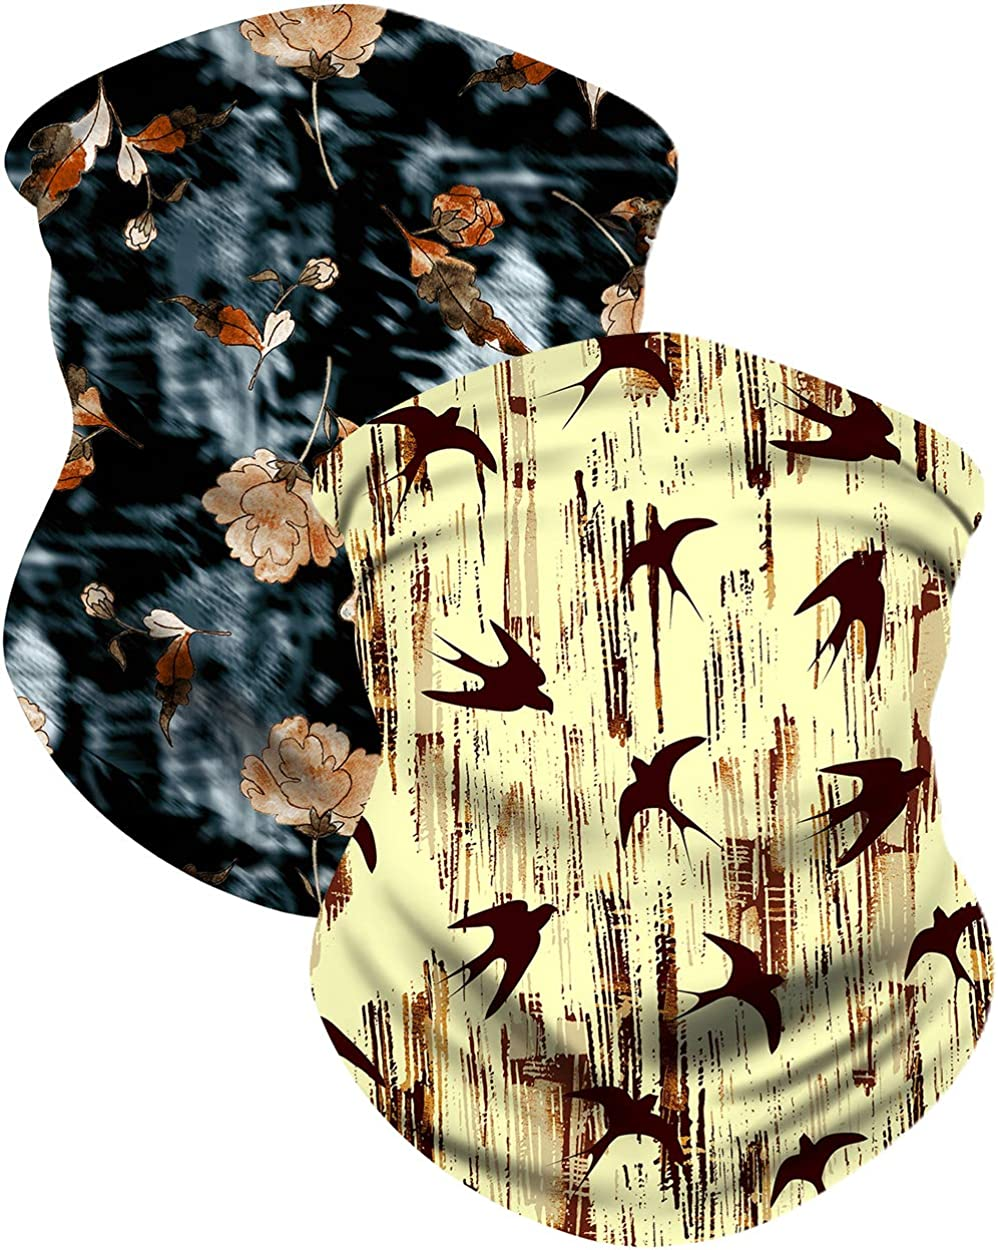 2 Pack Neck Gaiter Face Scarf Mask-Dust, Stylish Cooling Sports Cloth Shield Balaclava Moisture Wicking UPF 50+ Unisex